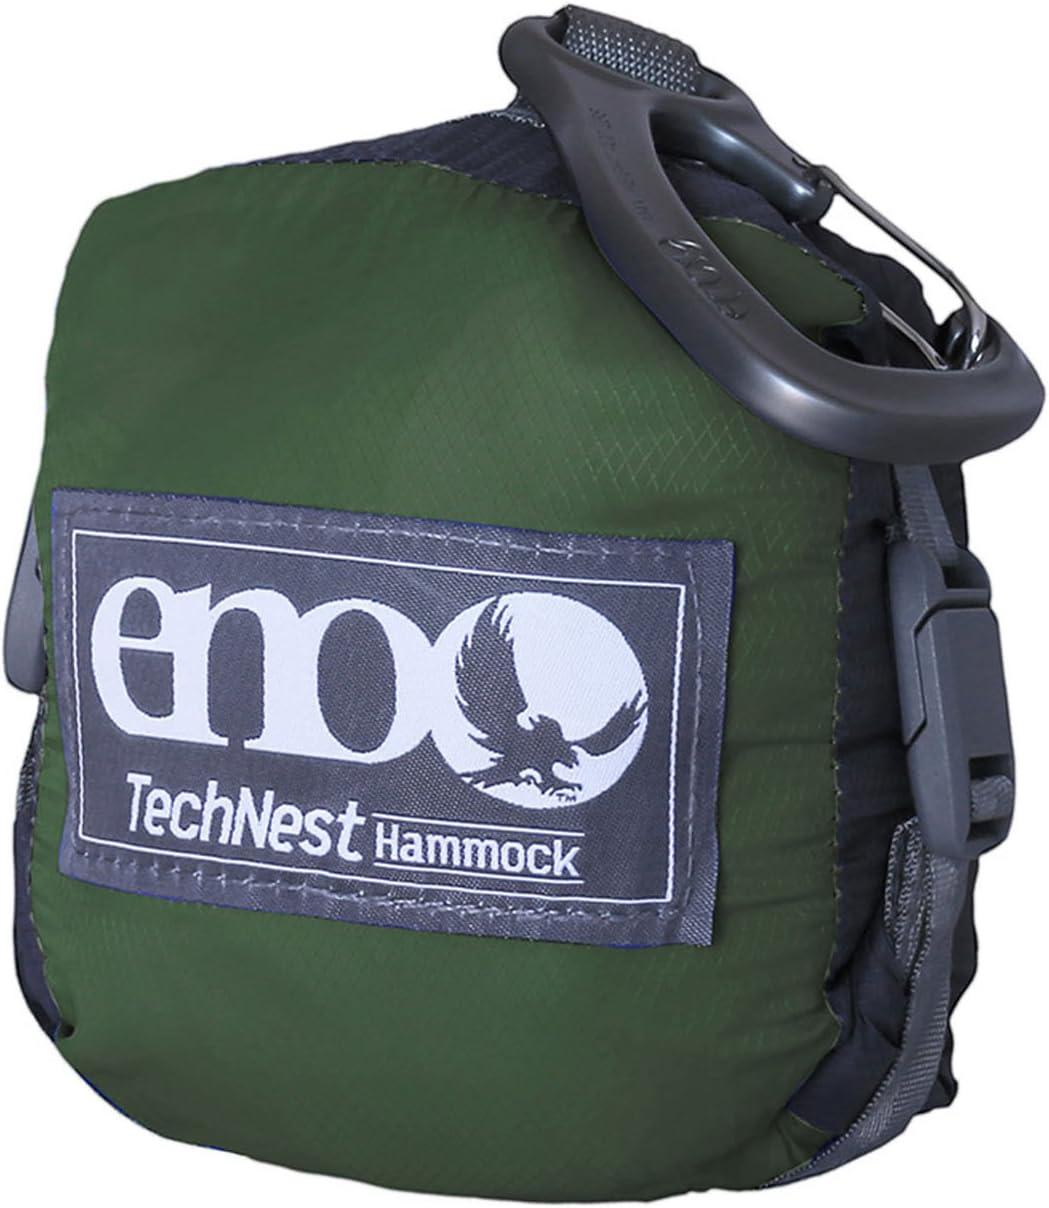 ENO Technest Hammock